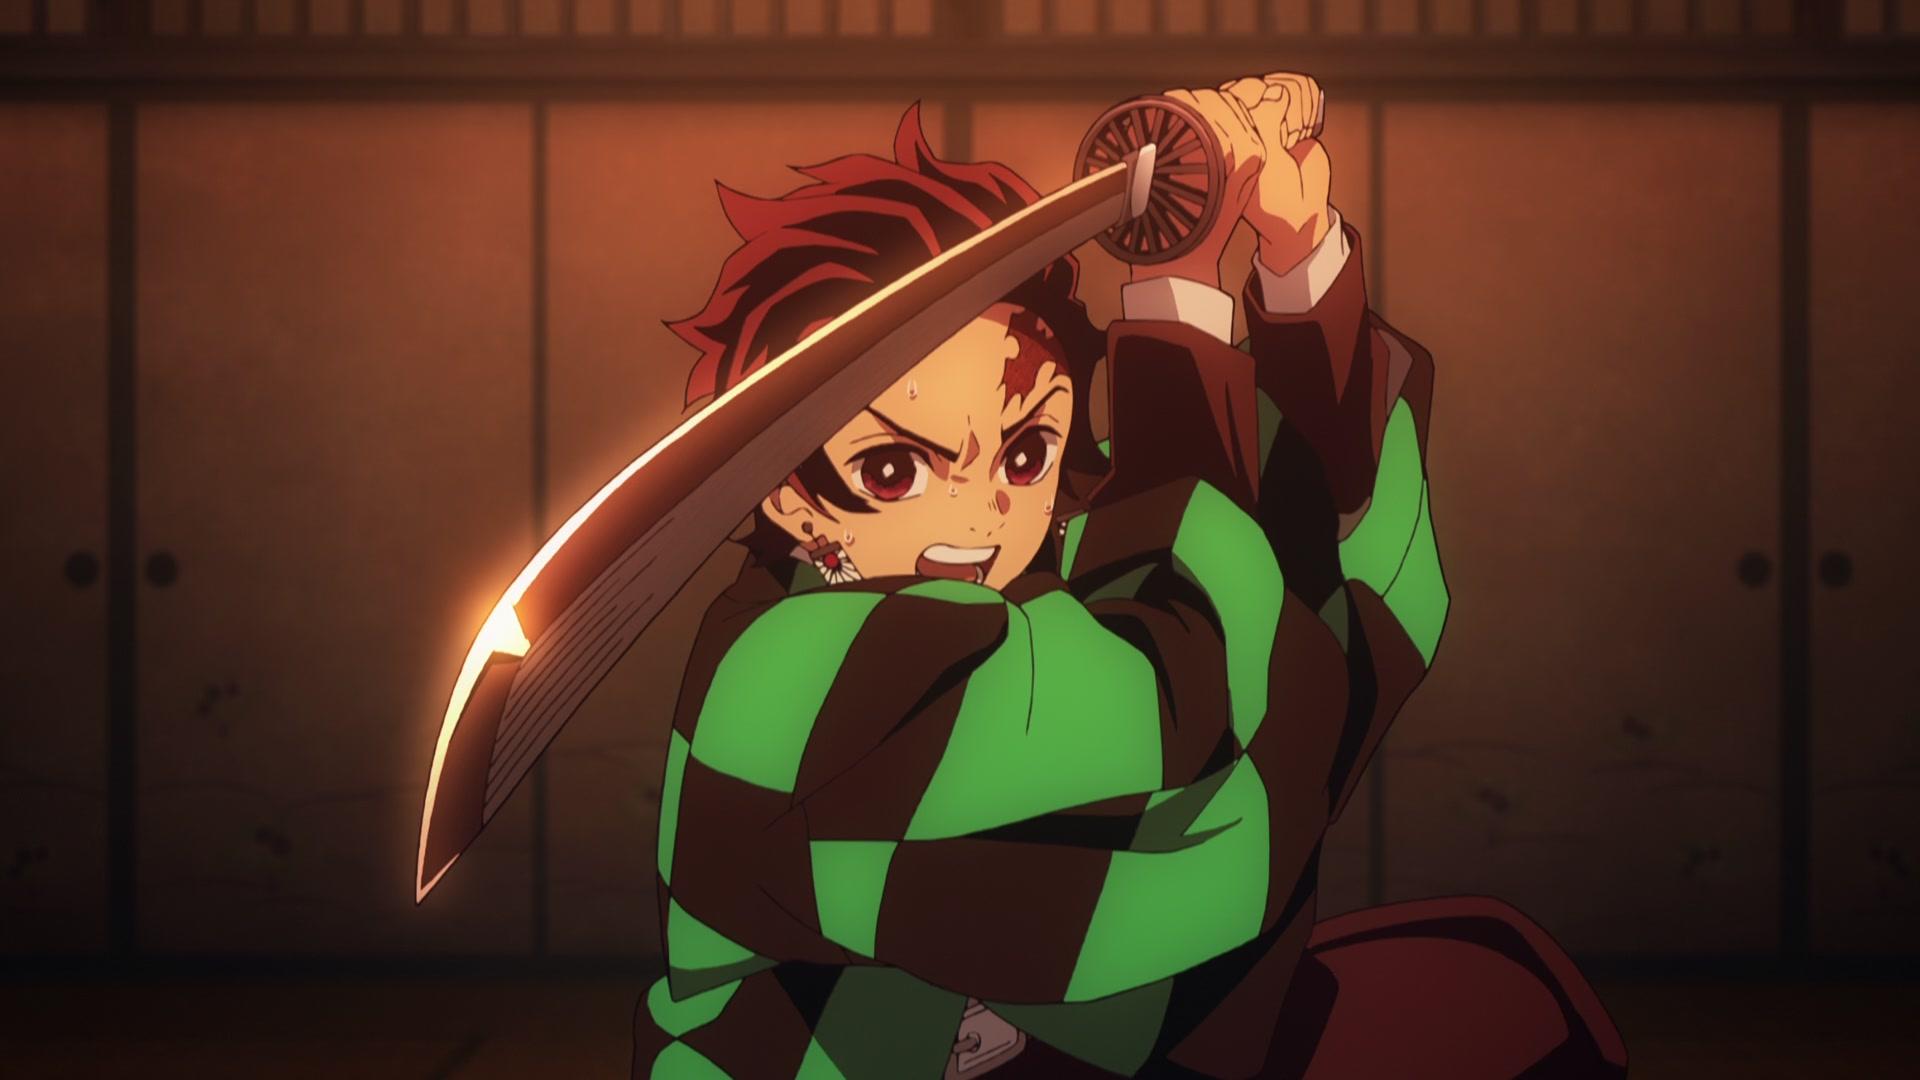 Tanjiro in Demon Slayer. Photo from Ufotable.